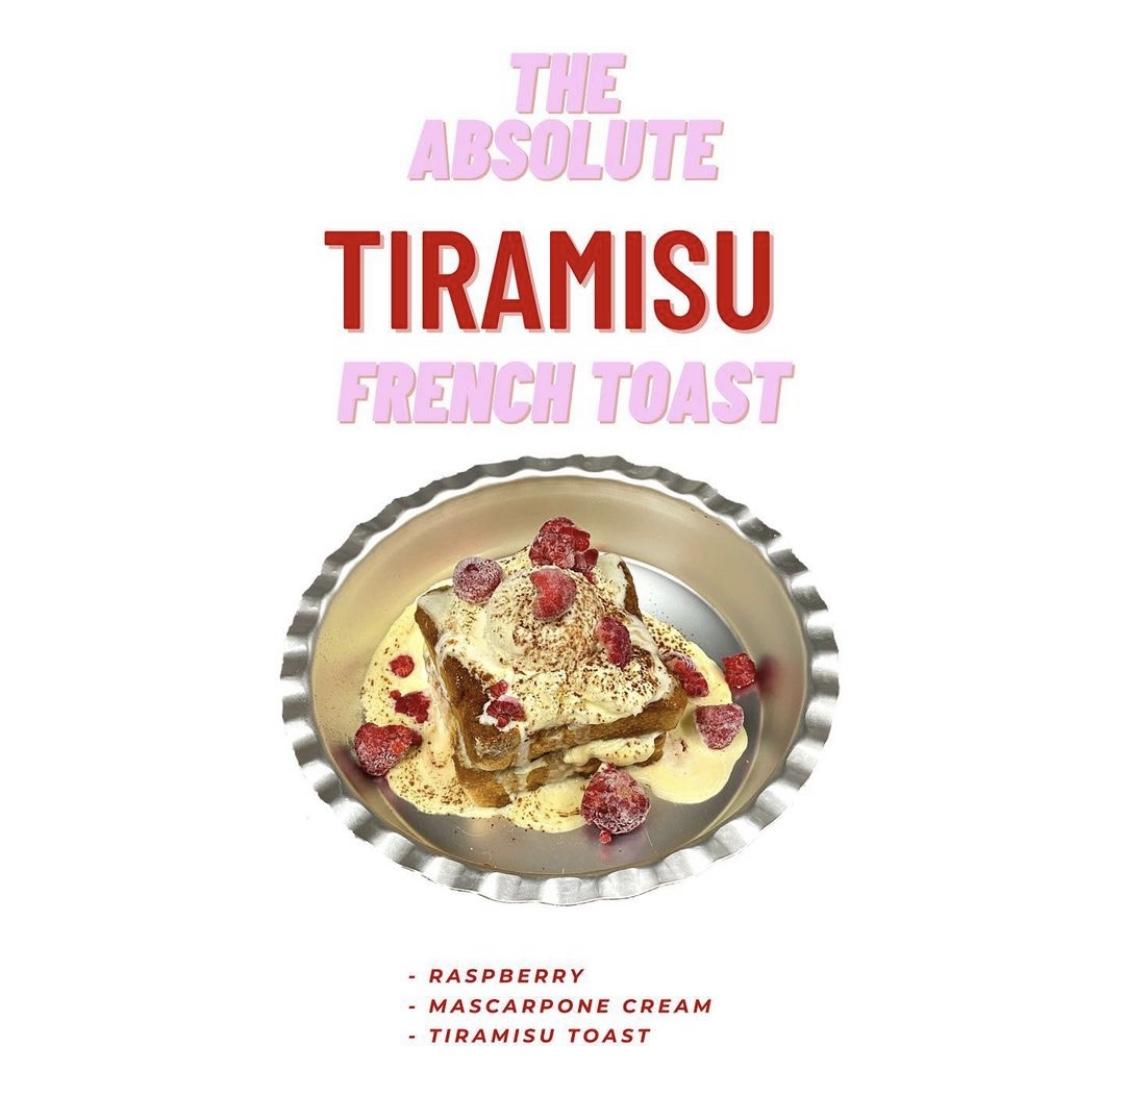 THE ABSOLUTE TIRAMISU FRENCH TOAST